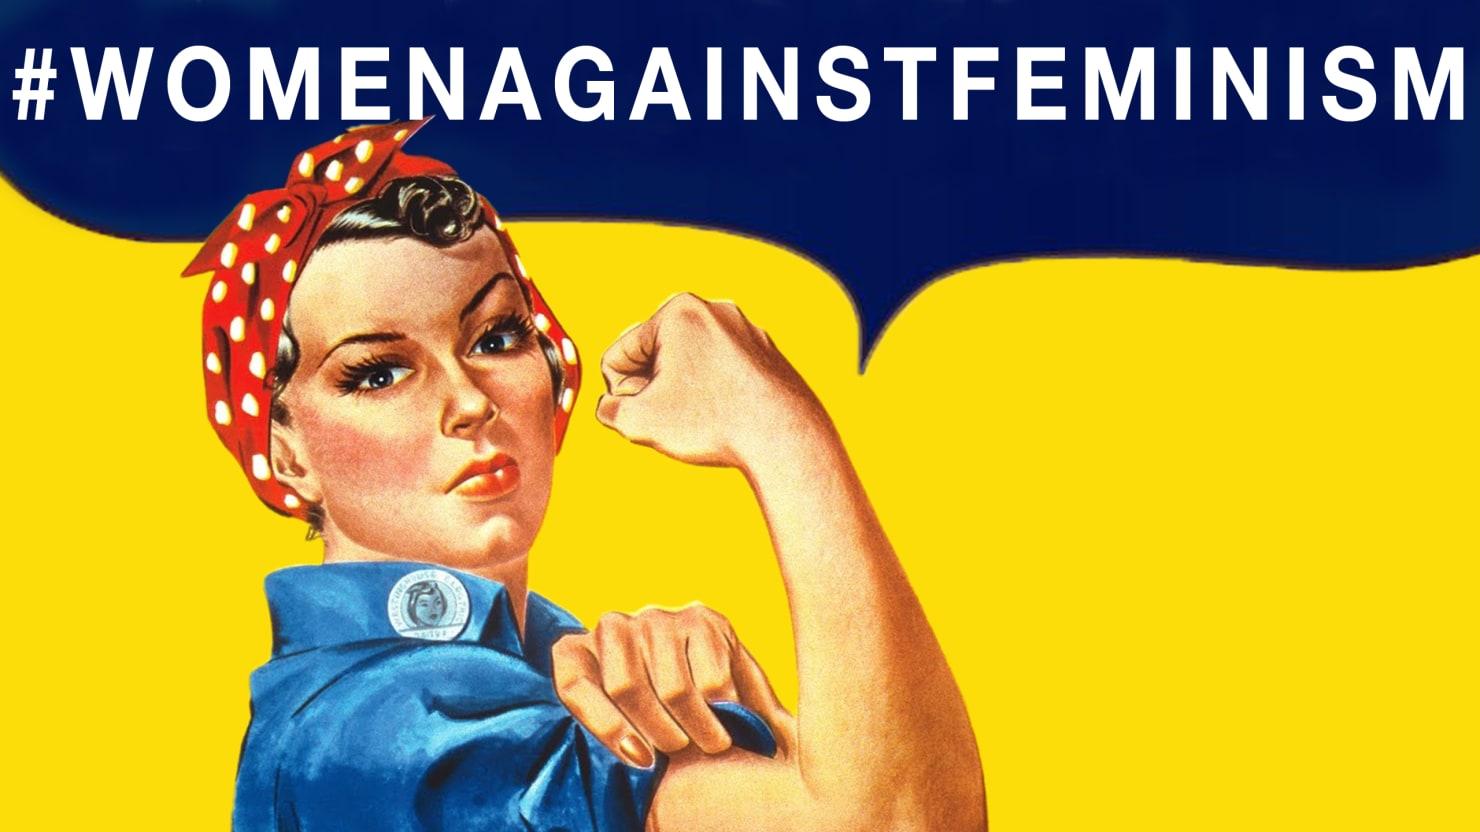 140721 shire feminism tease trwuyo